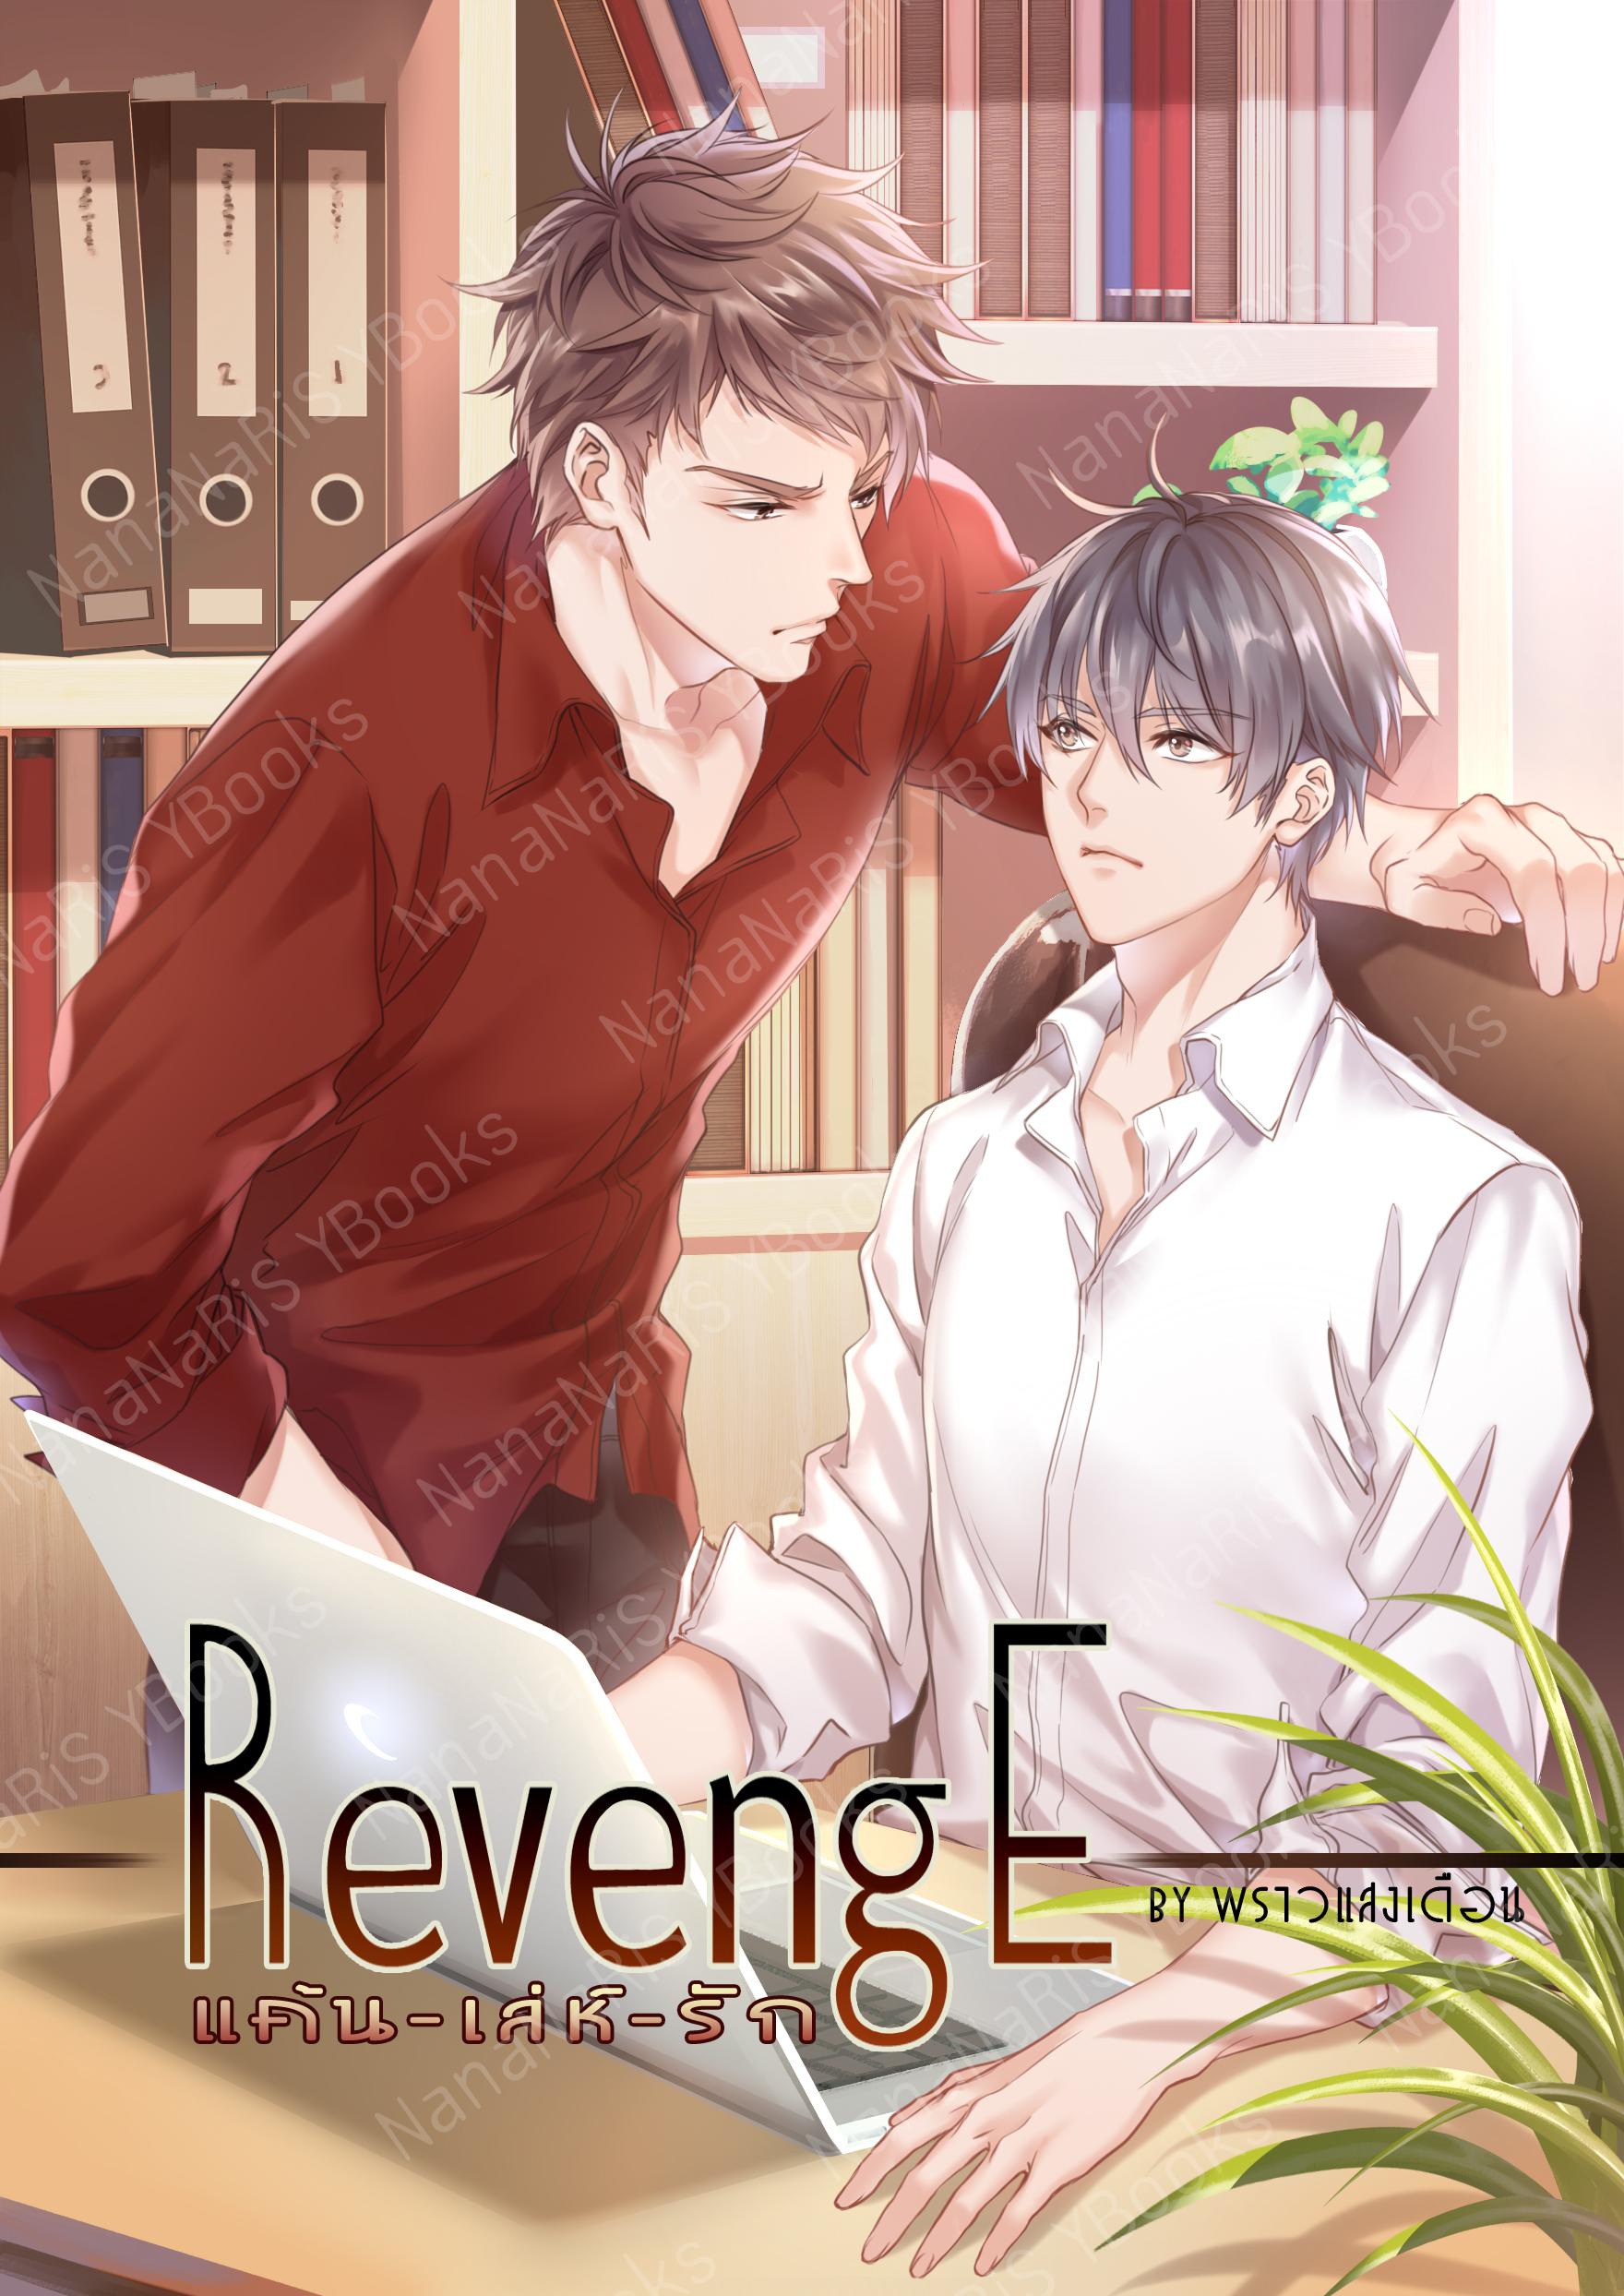 [Pre Order] Revenge แค้น เล่ห์ รัก by พราวแสงเดือน